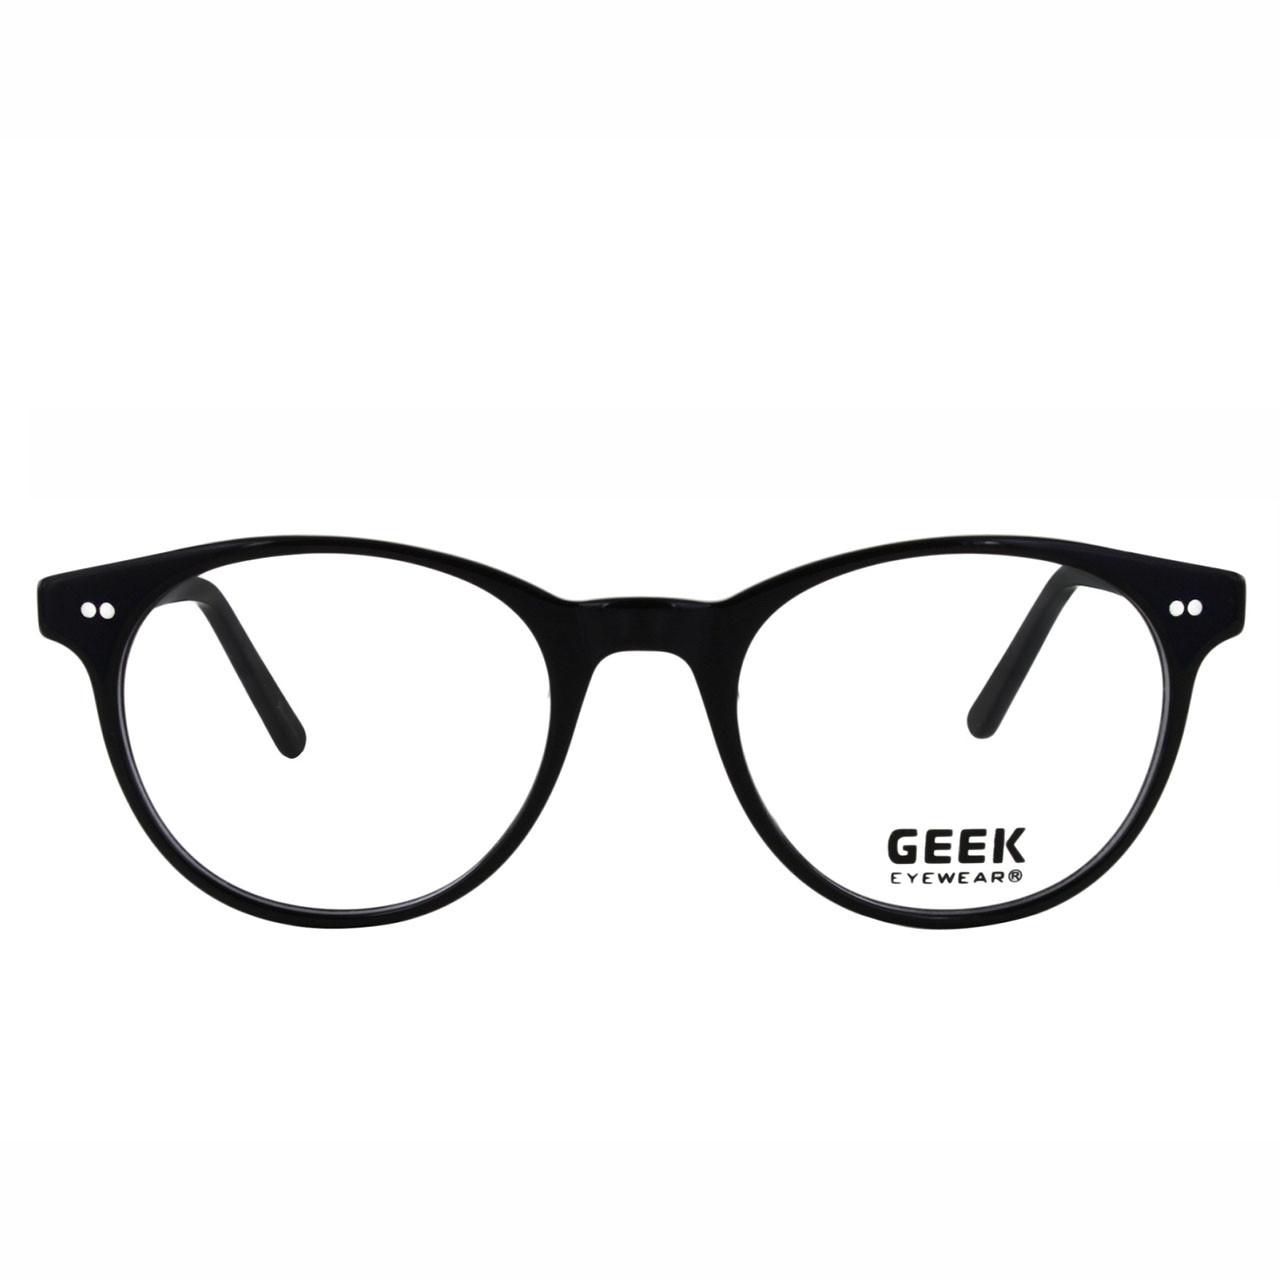 GEEK Eyewear GEEK Textbook 2